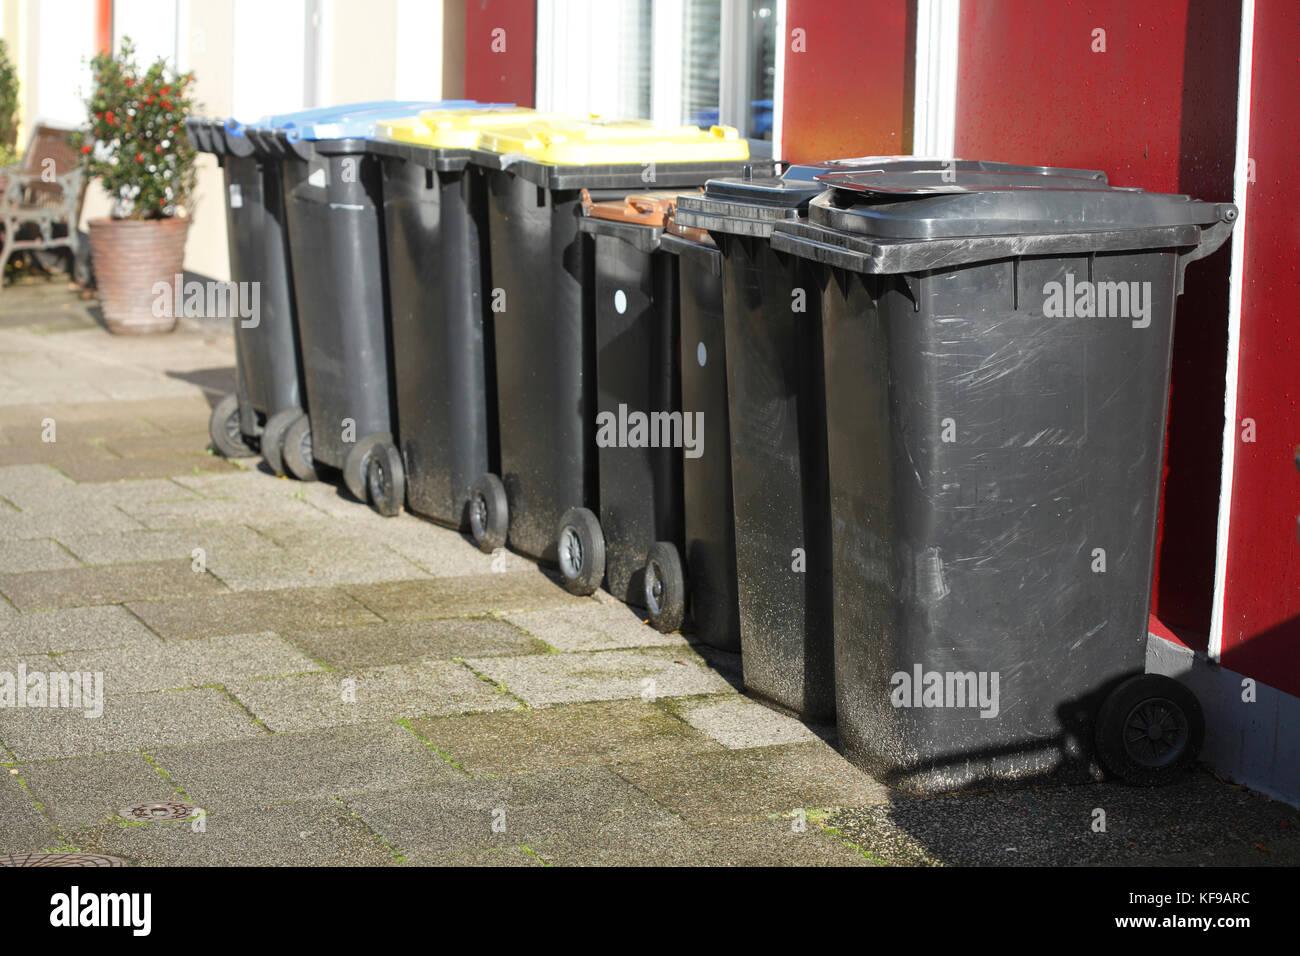 ecycling bins Stock Photo